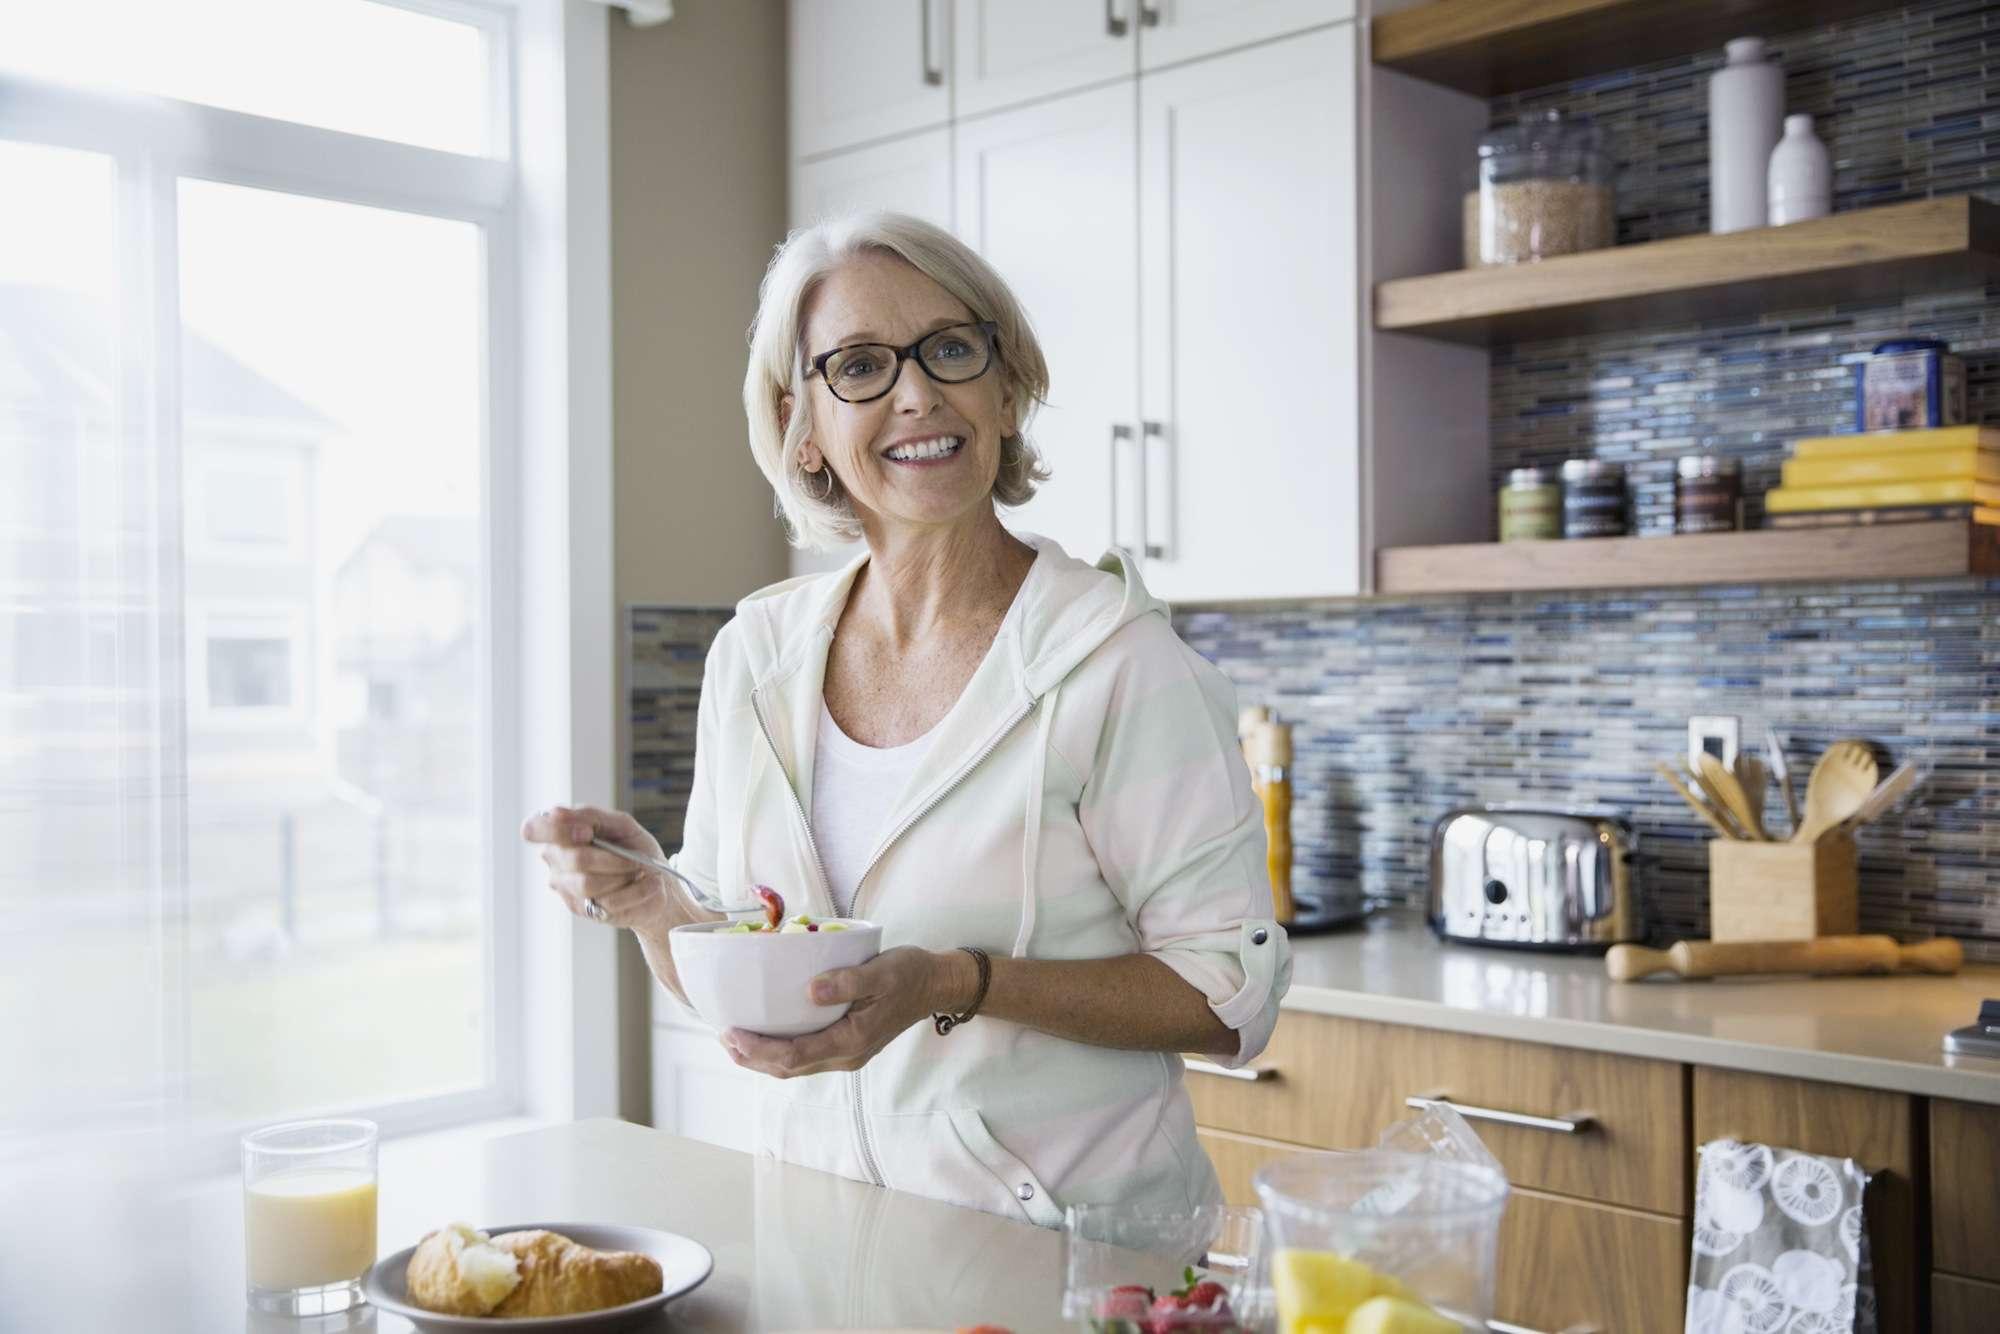 Smiling woman eating fruit salad in kitchen